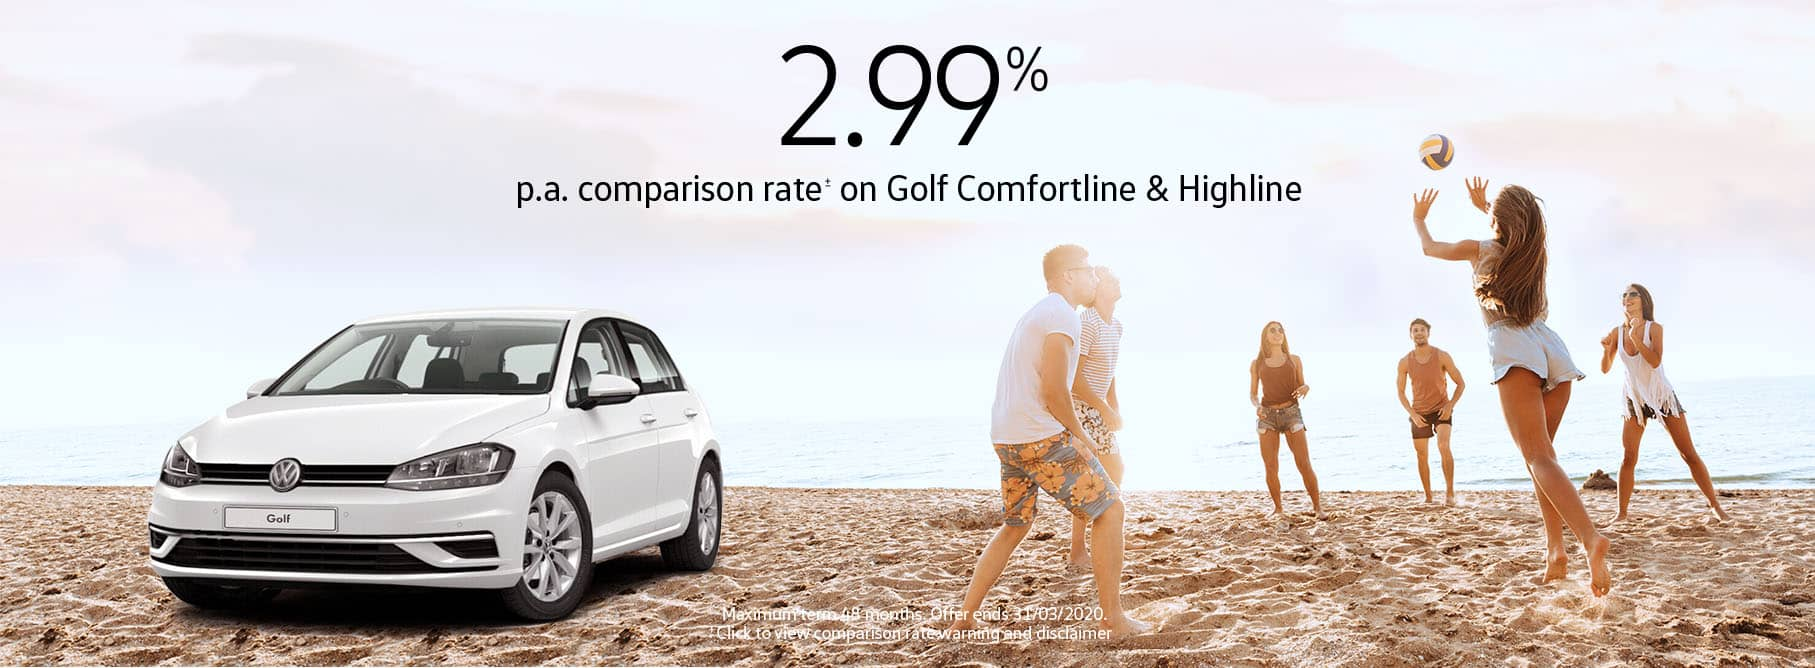 2.99 Comparison raate Golf Comfortline and Highline